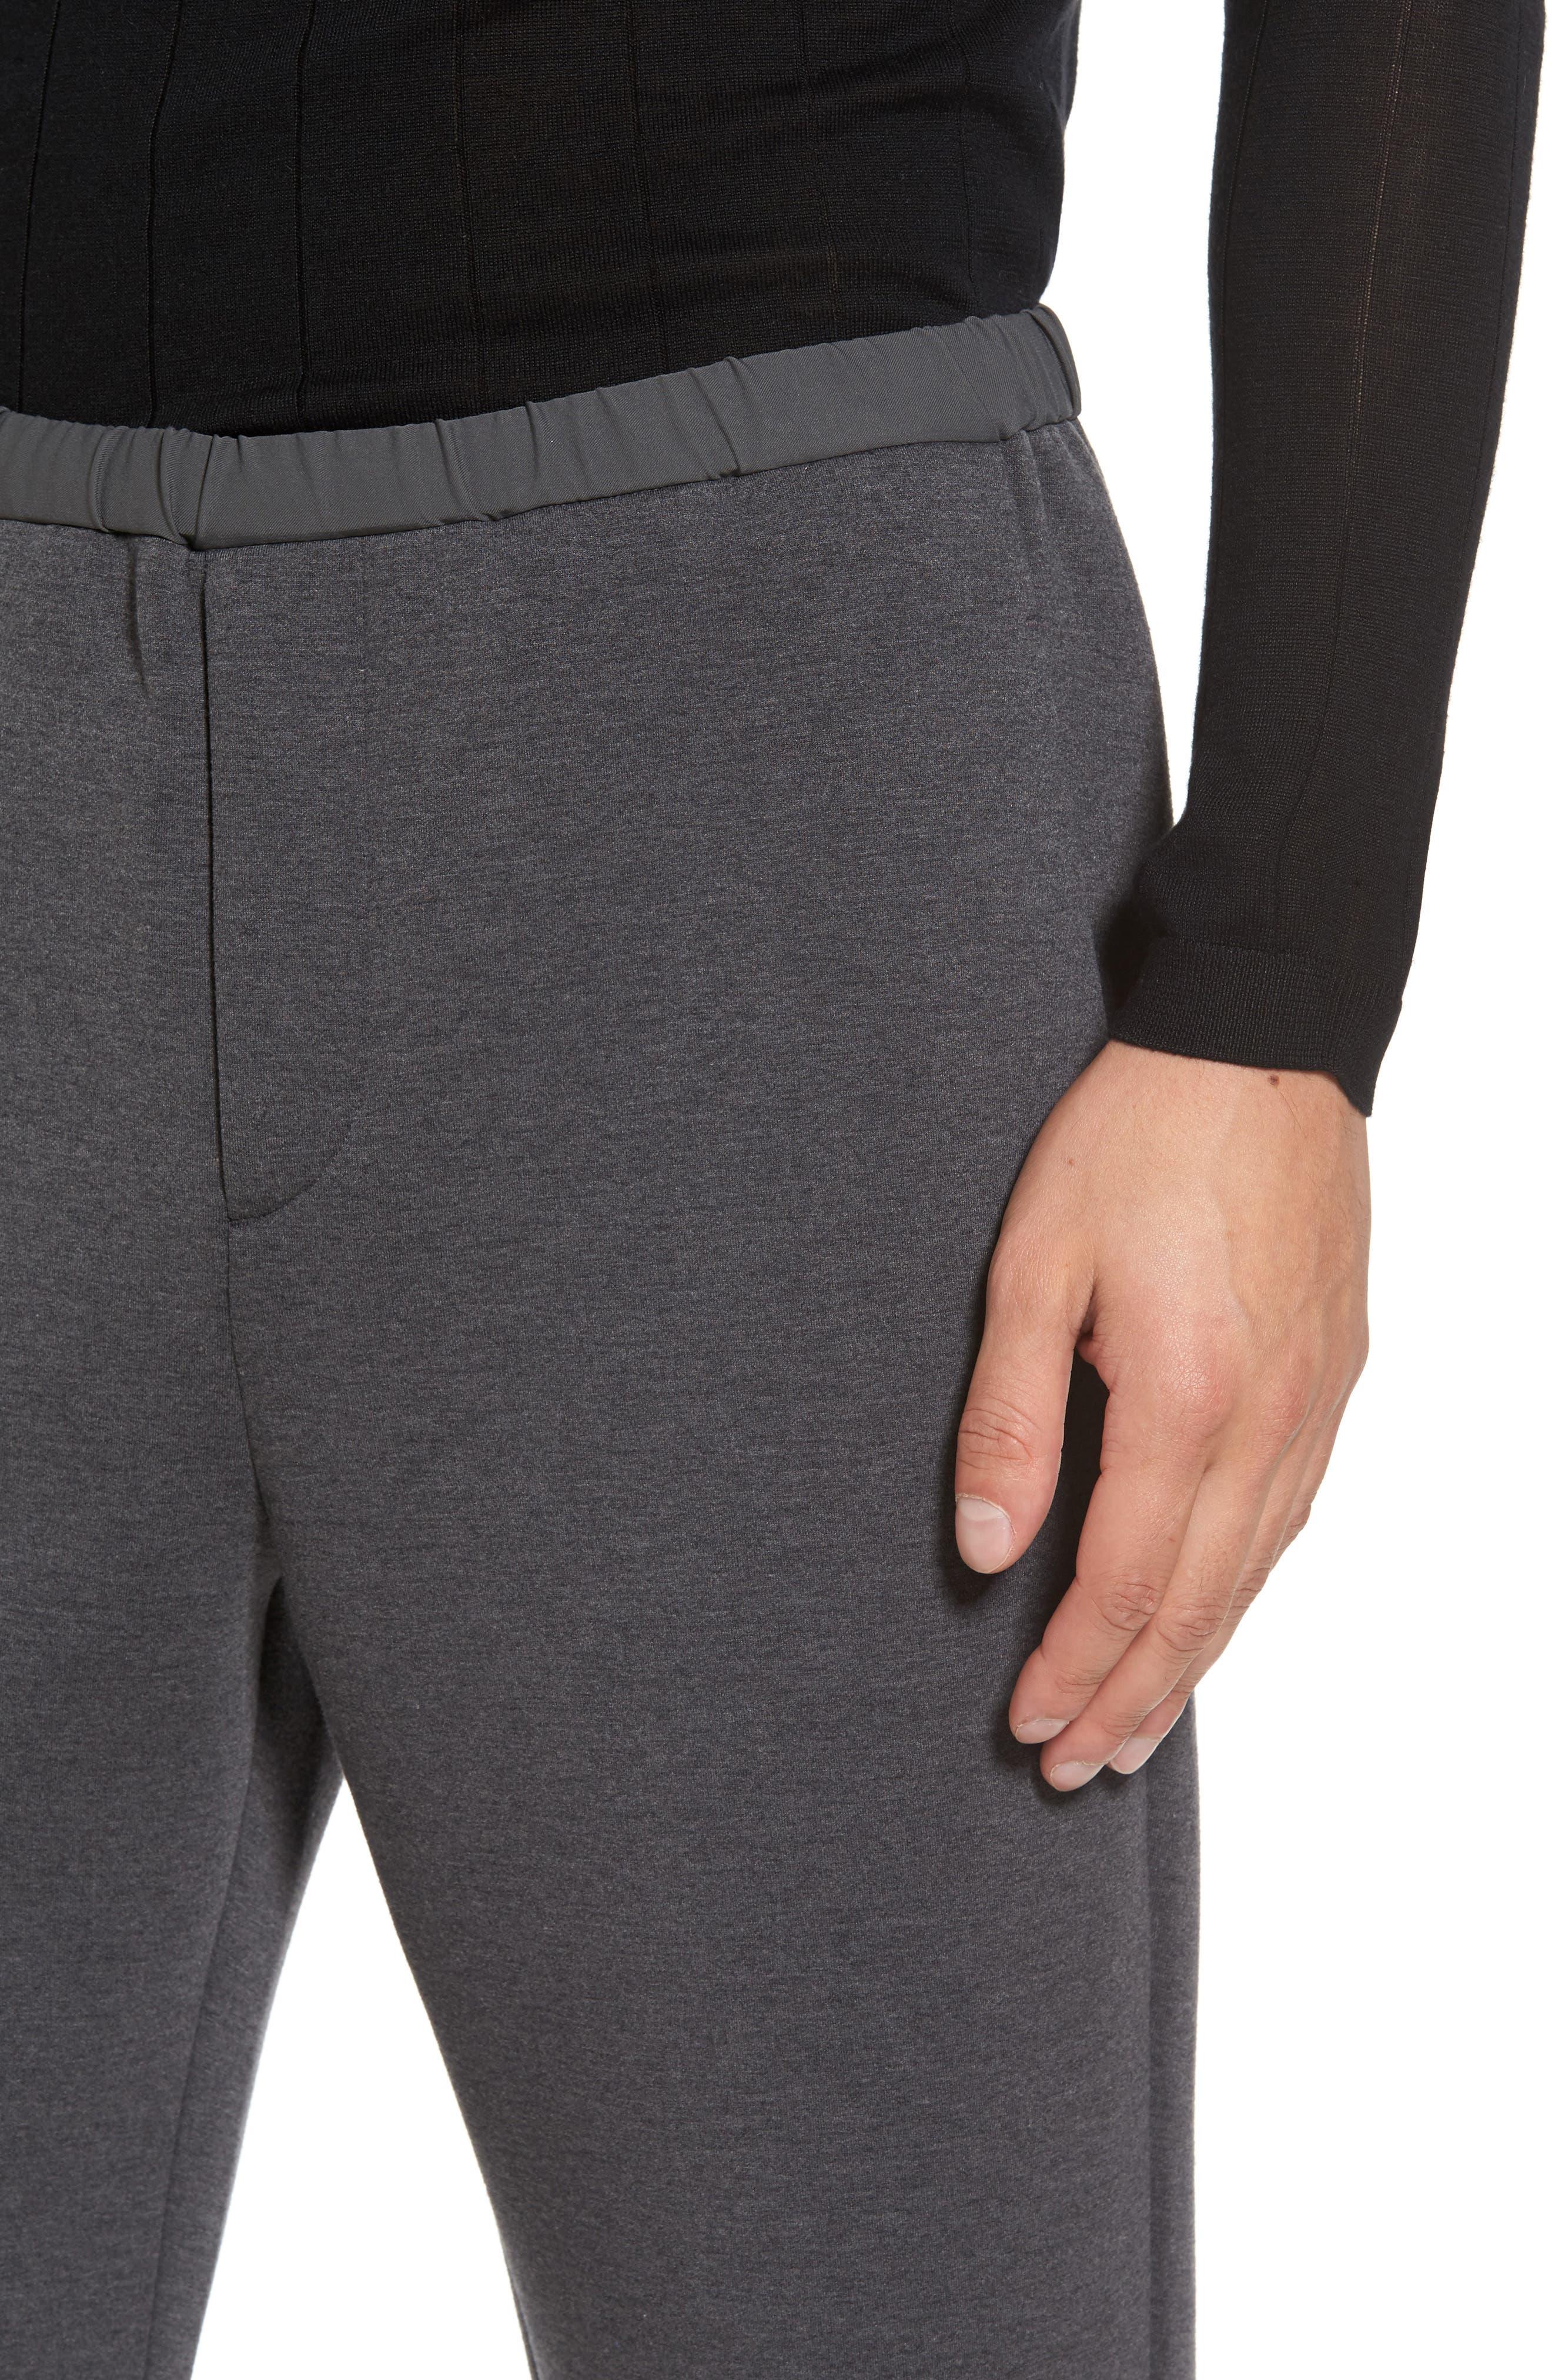 Knit Lounge Pants,                             Alternate thumbnail 4, color,                             Charcoal Heather